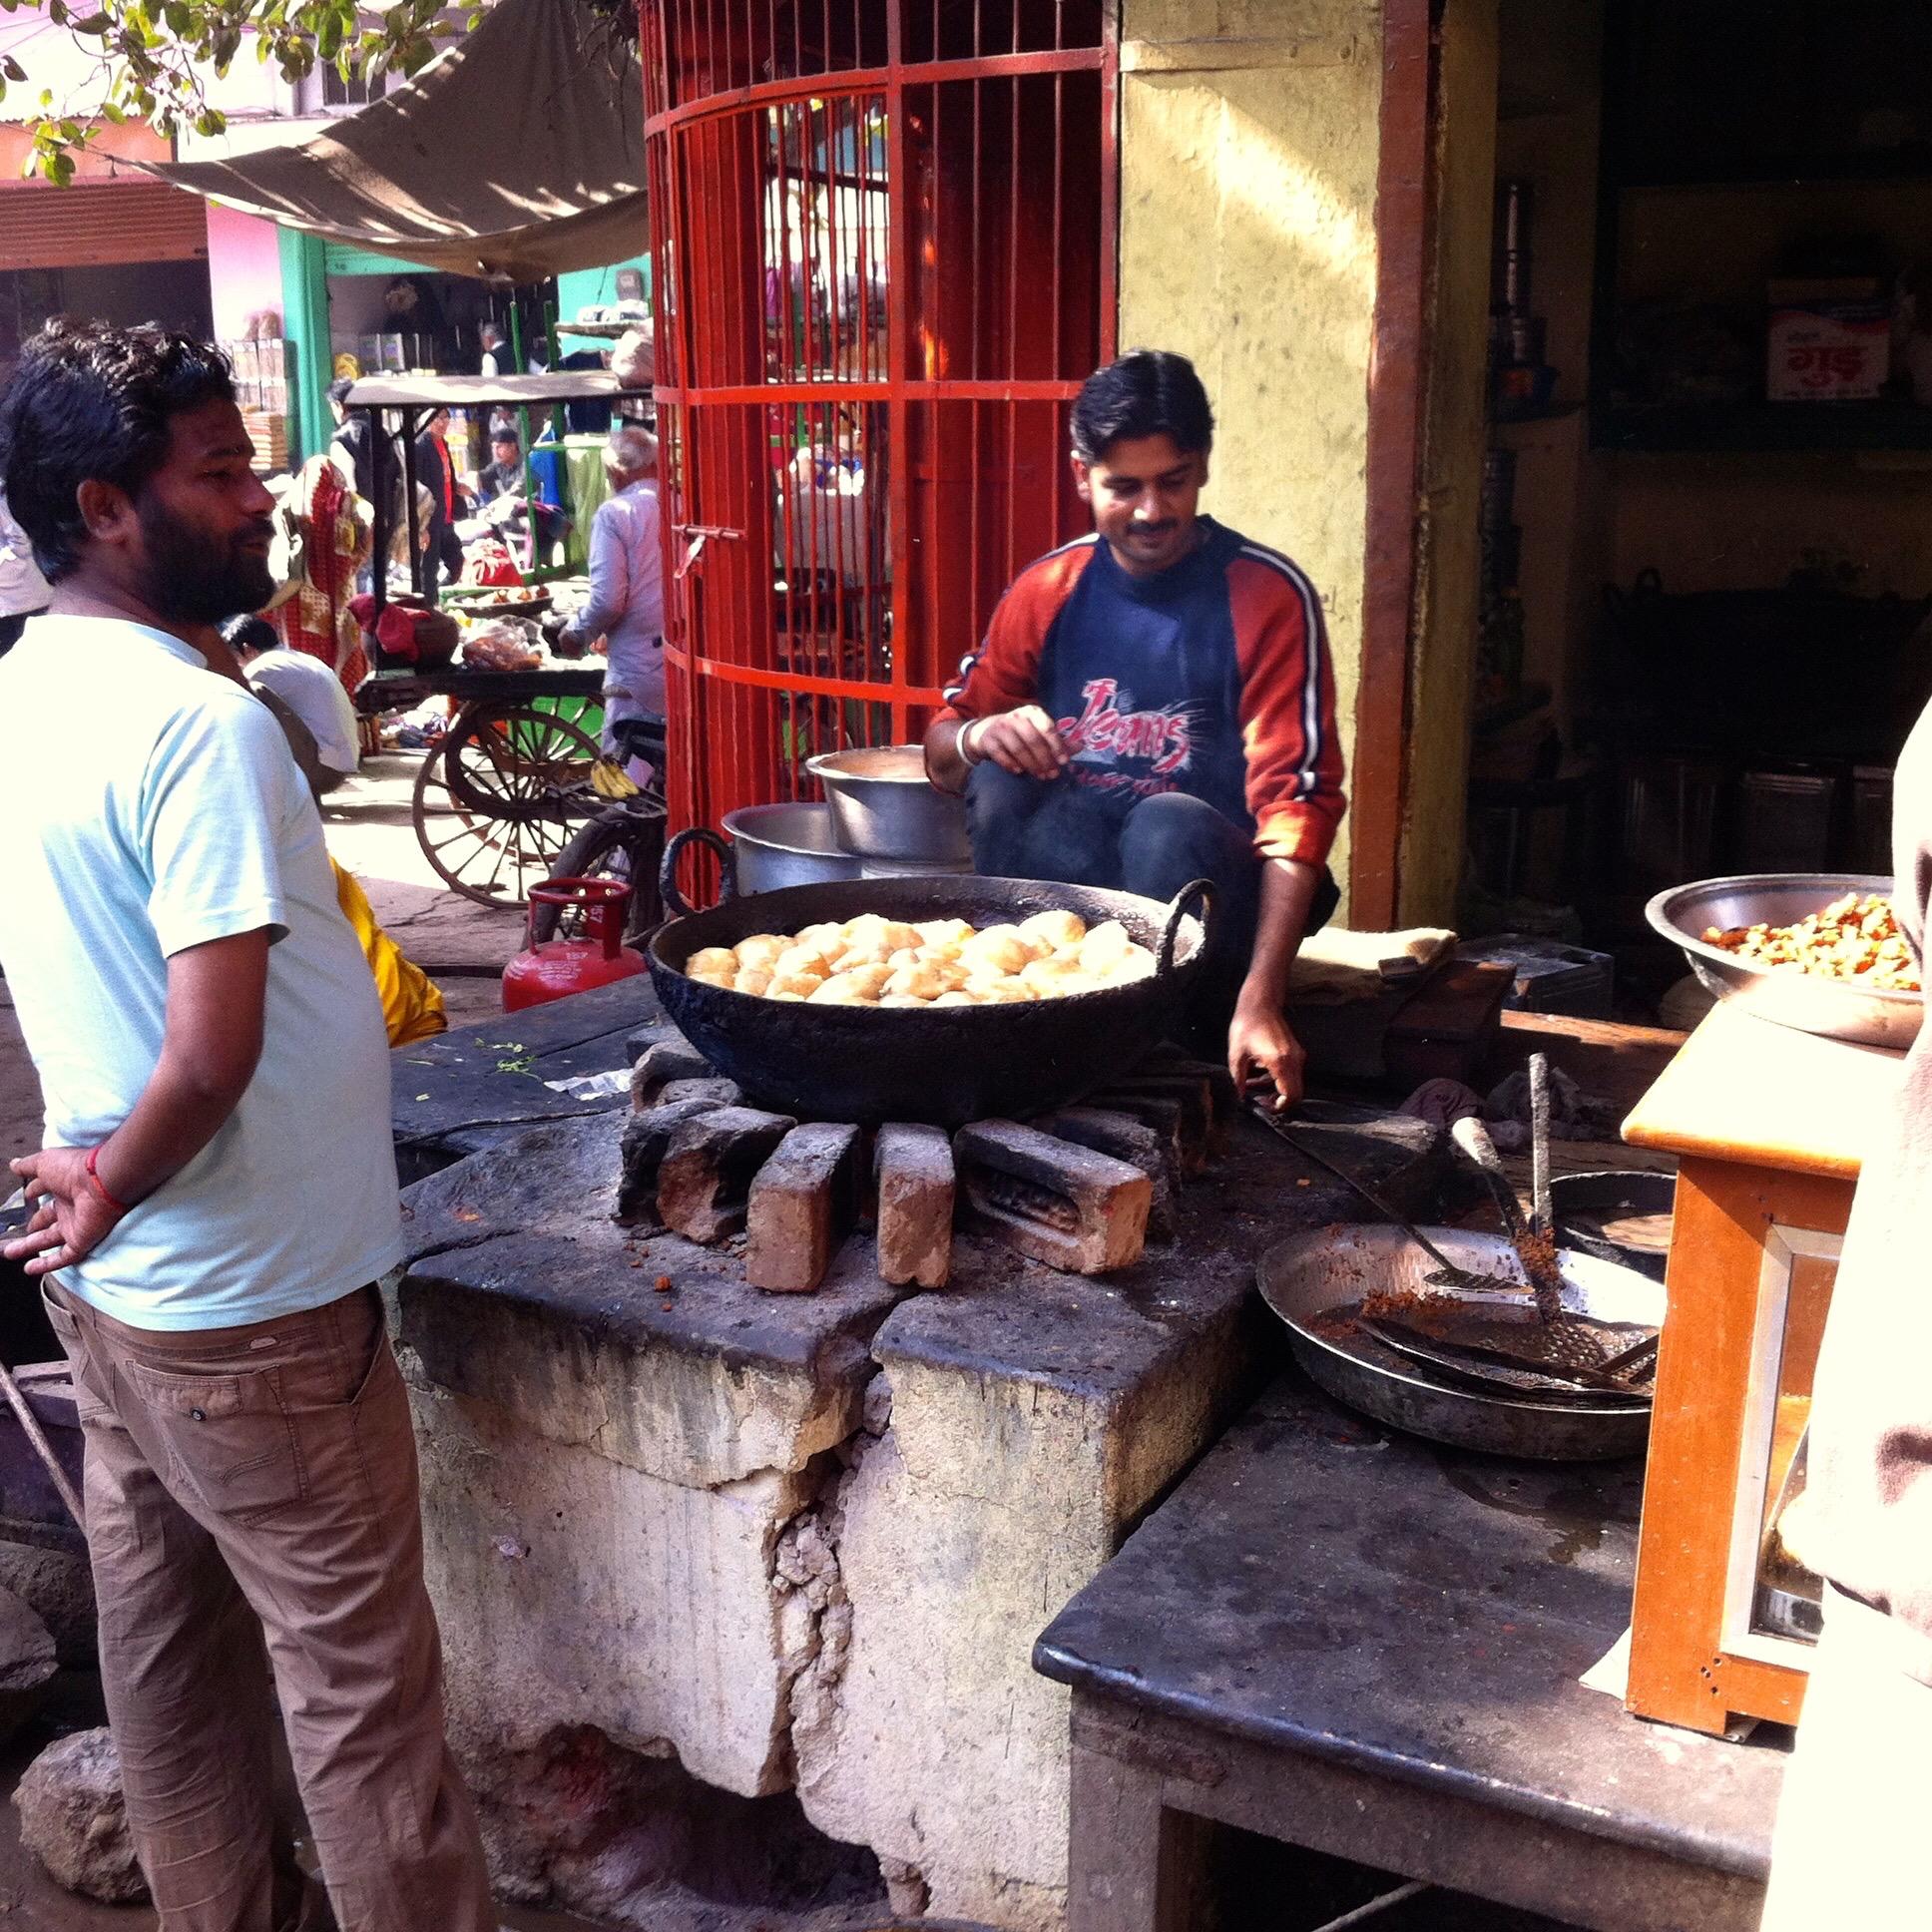 Best samosa we had, was in this tiny corner of Nawalgarh baazar, Hot, spicy, and fresh